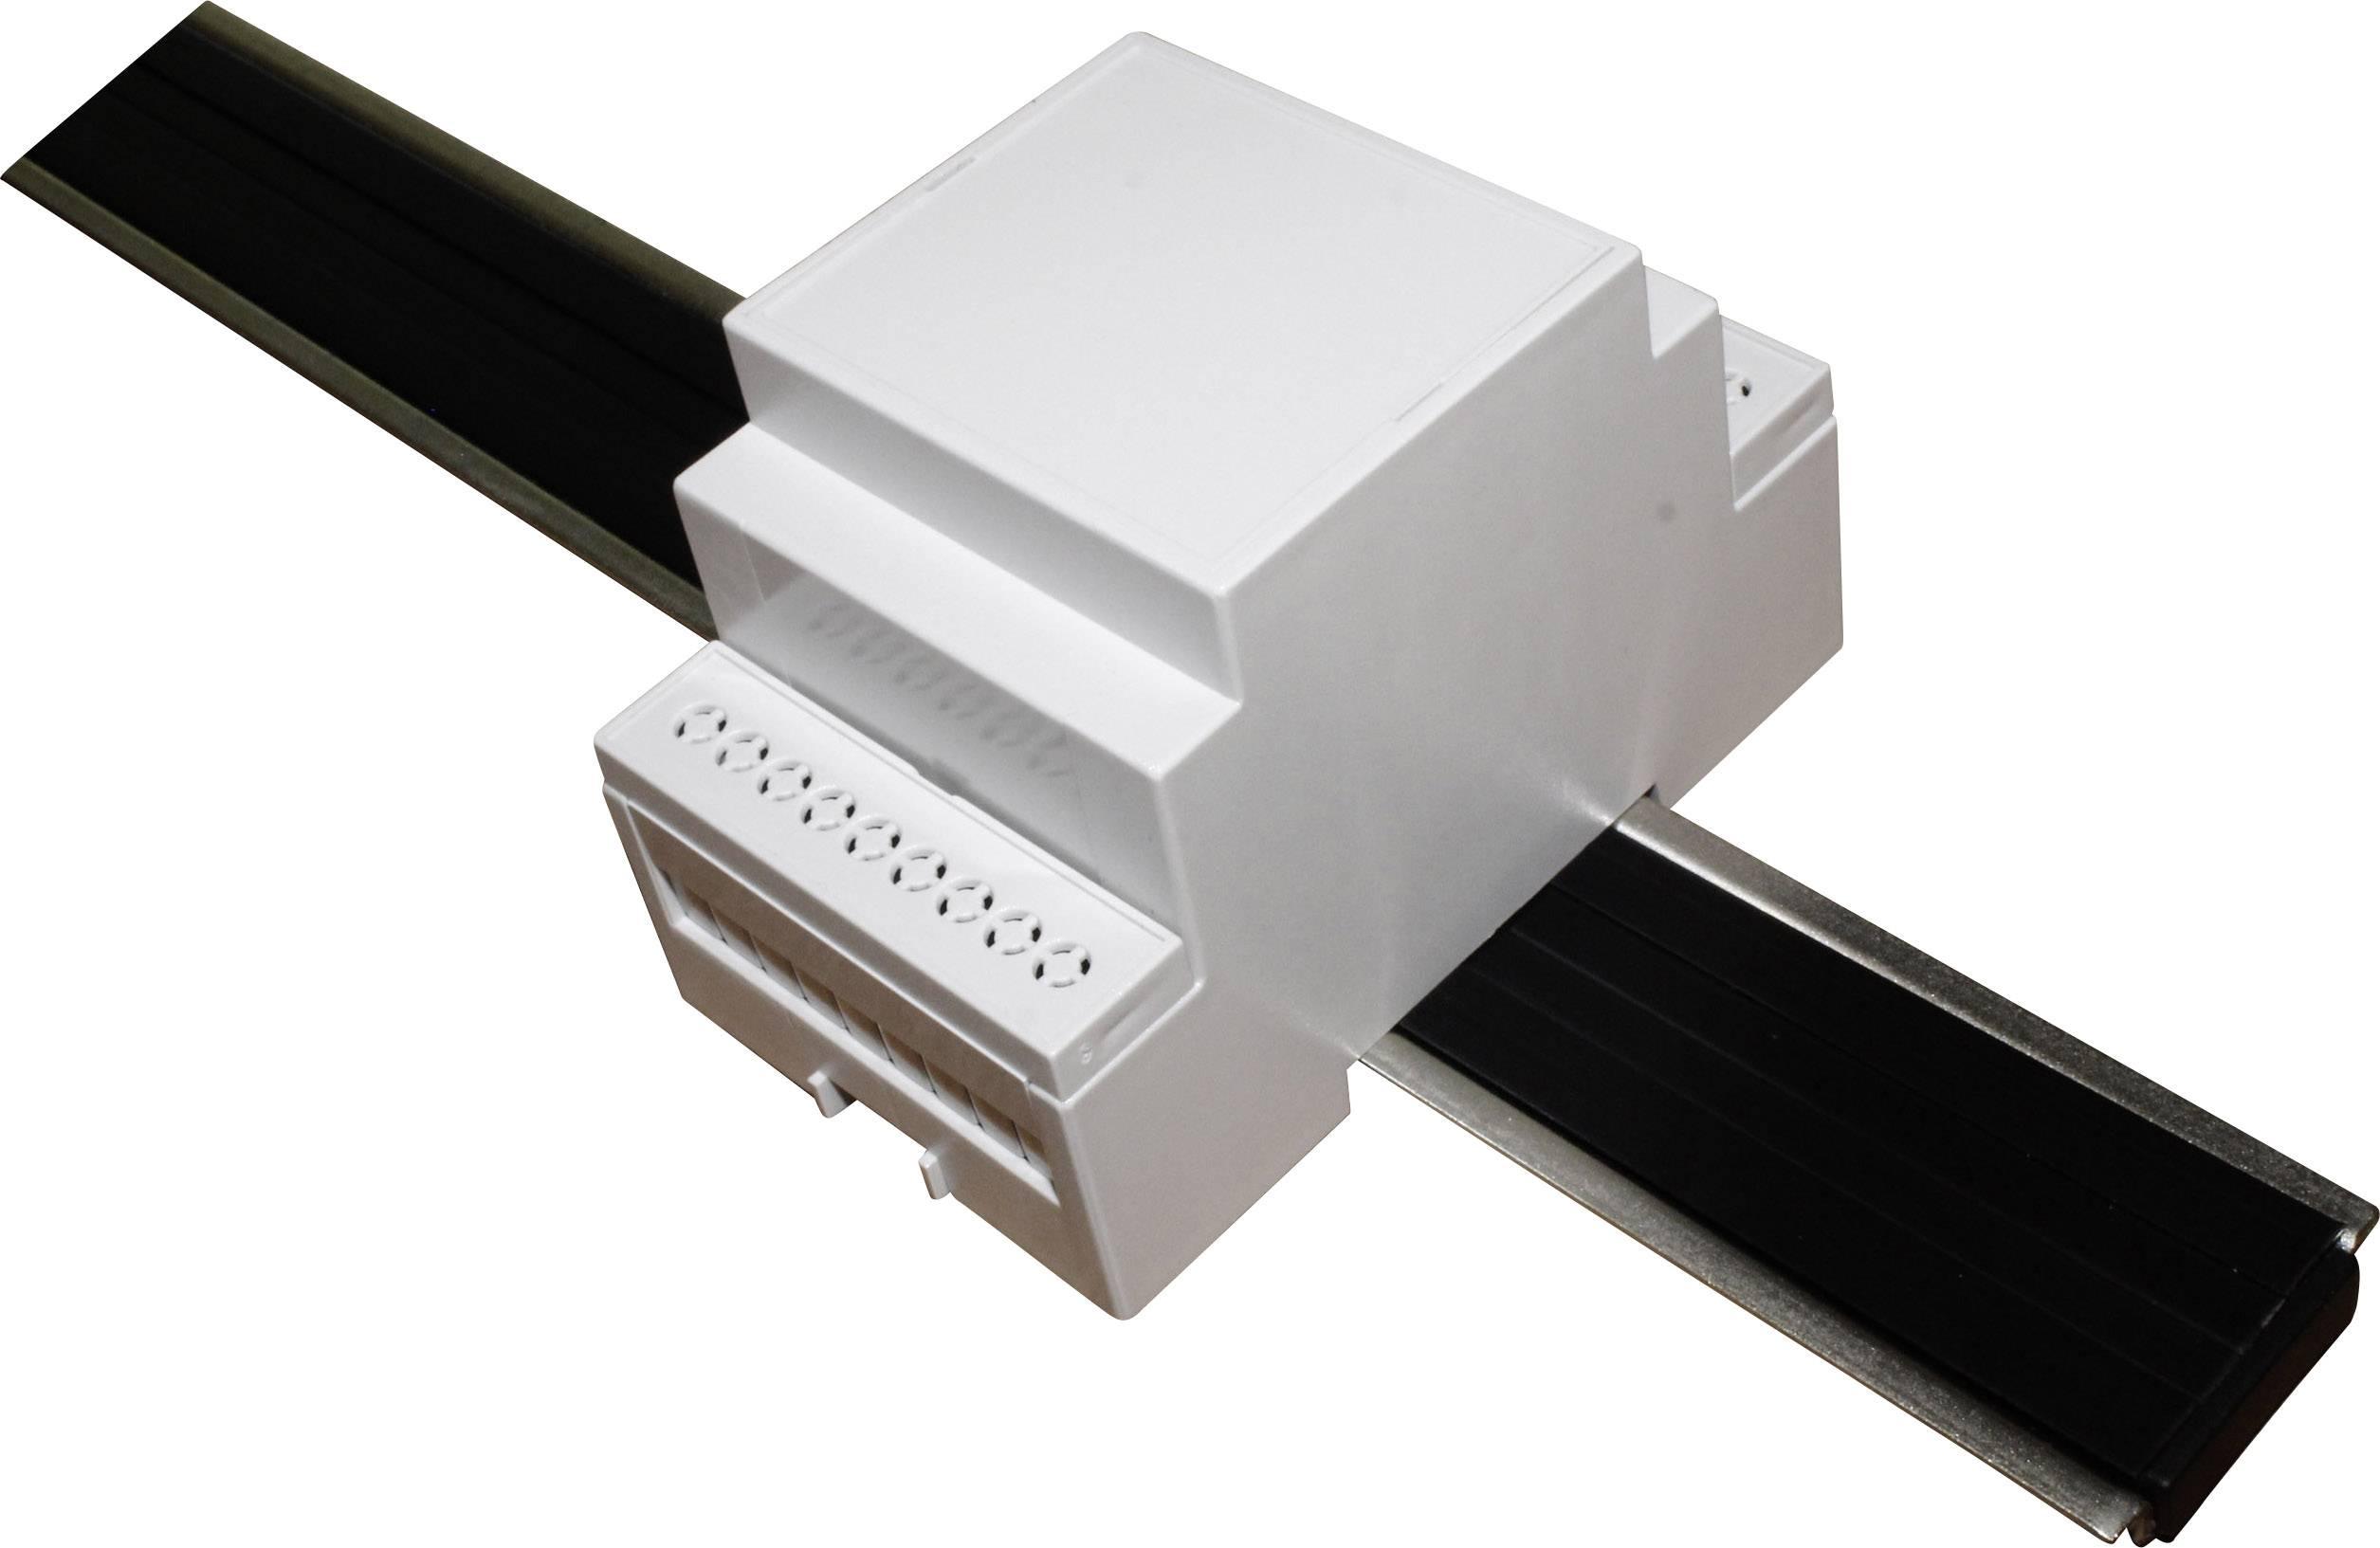 Pouzdro na DIN lištu Axxatronic CNMB/3/KIT/ACTIVE25-CON pro montáž na DIN lištu , 58 x 53 x 90 , polykarbonát, šedá, 1 ks